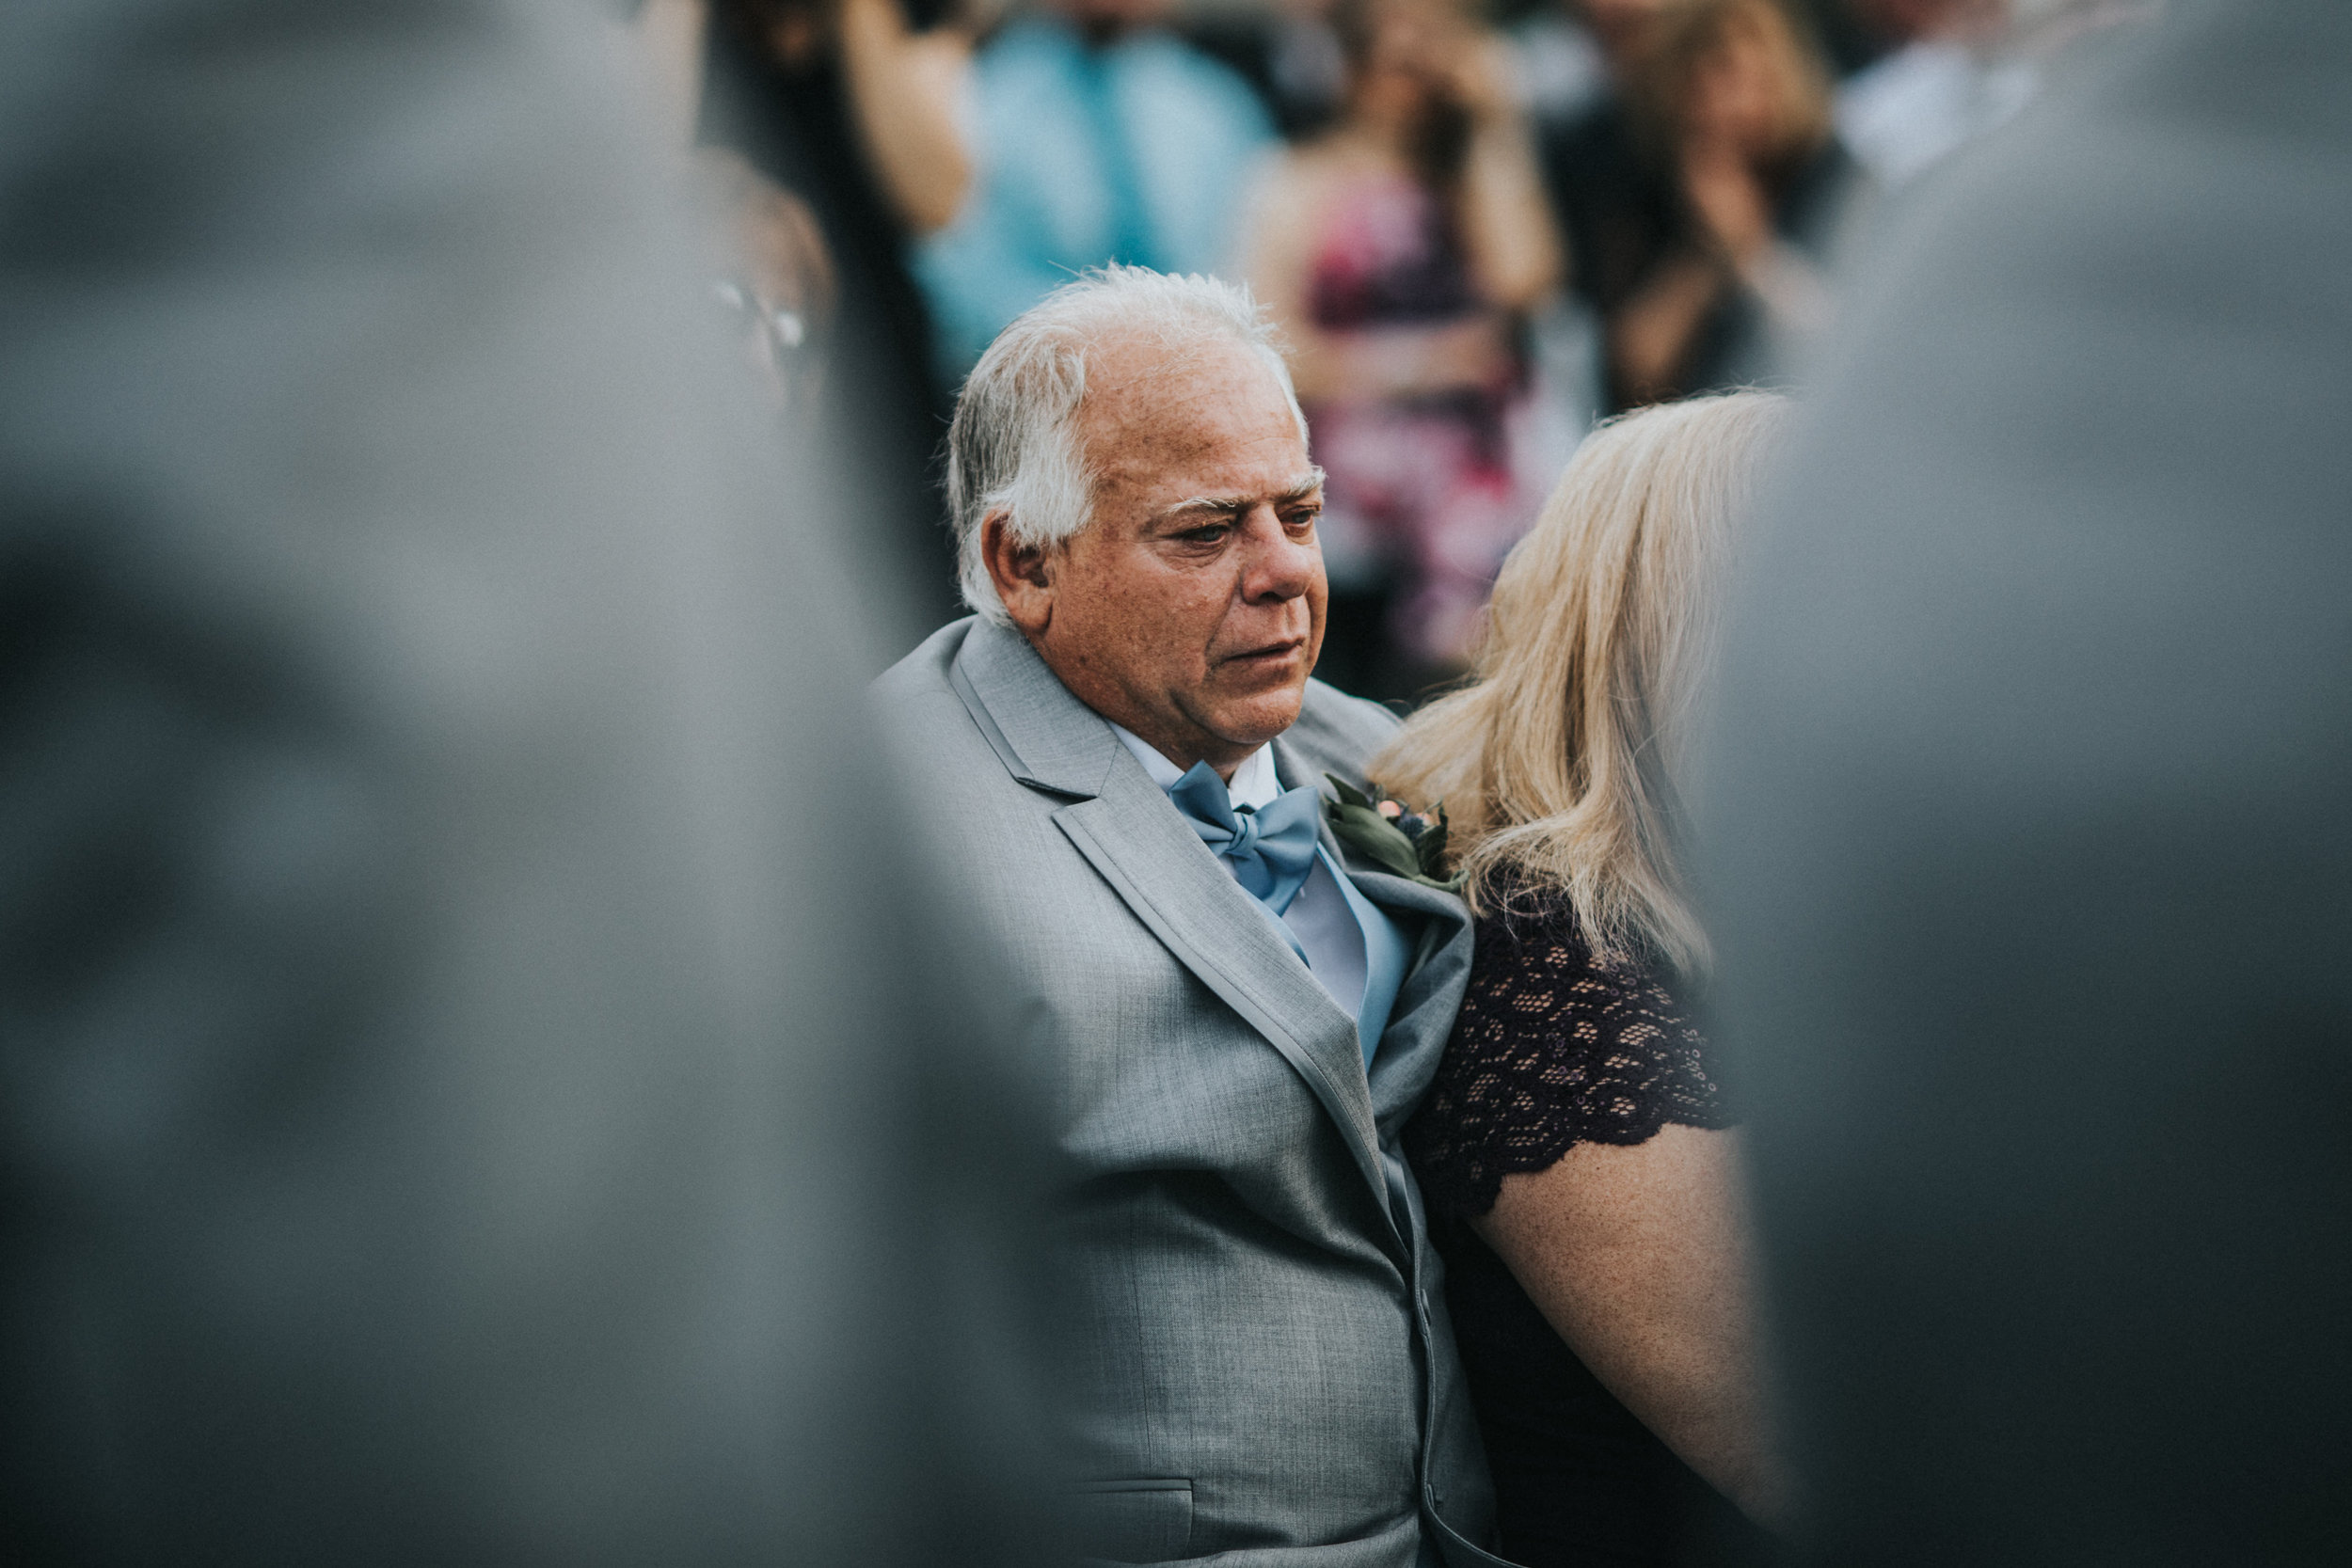 New-Jersey-Wedding-Photographer-JennaLynnPhotography-ValenzanoWinery-Ceremony-99.jpg